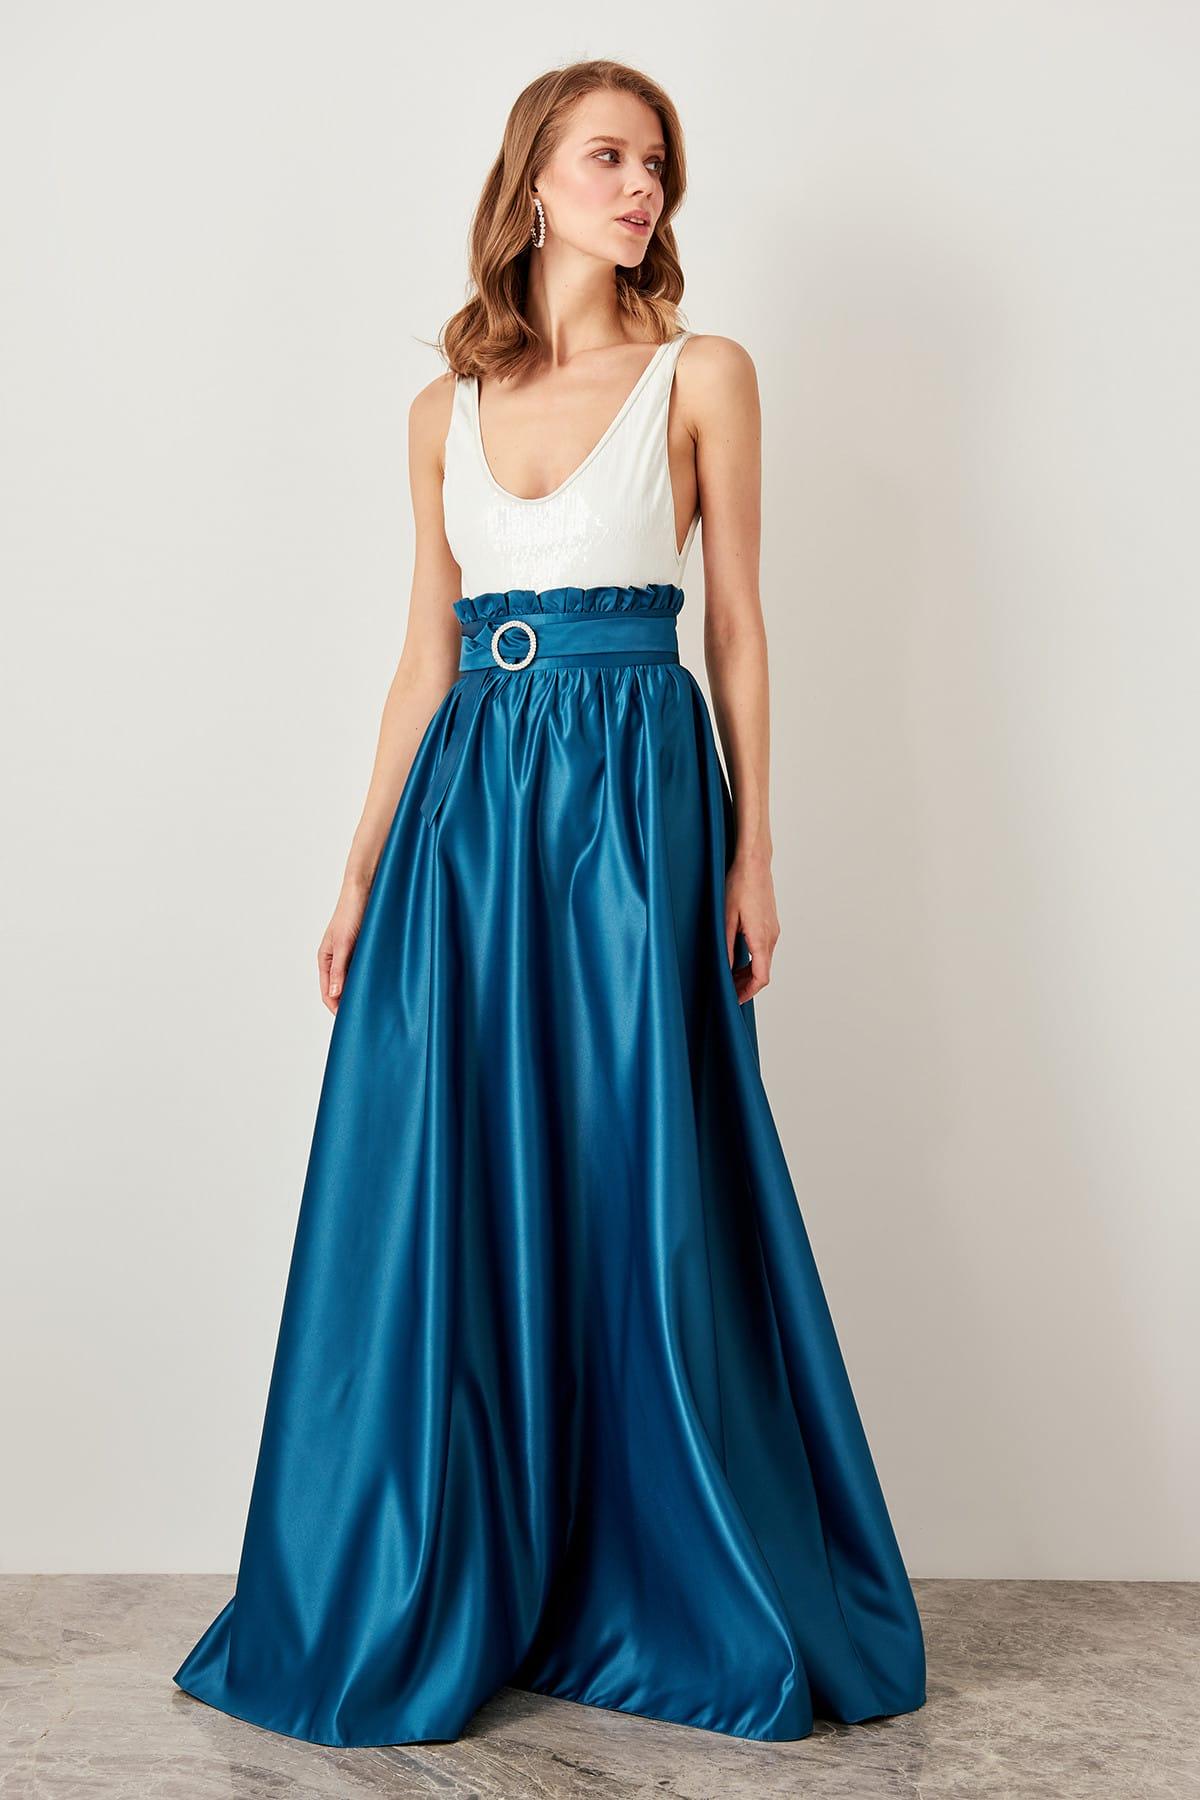 Trendyol High Waist Skirt Oil-Arched